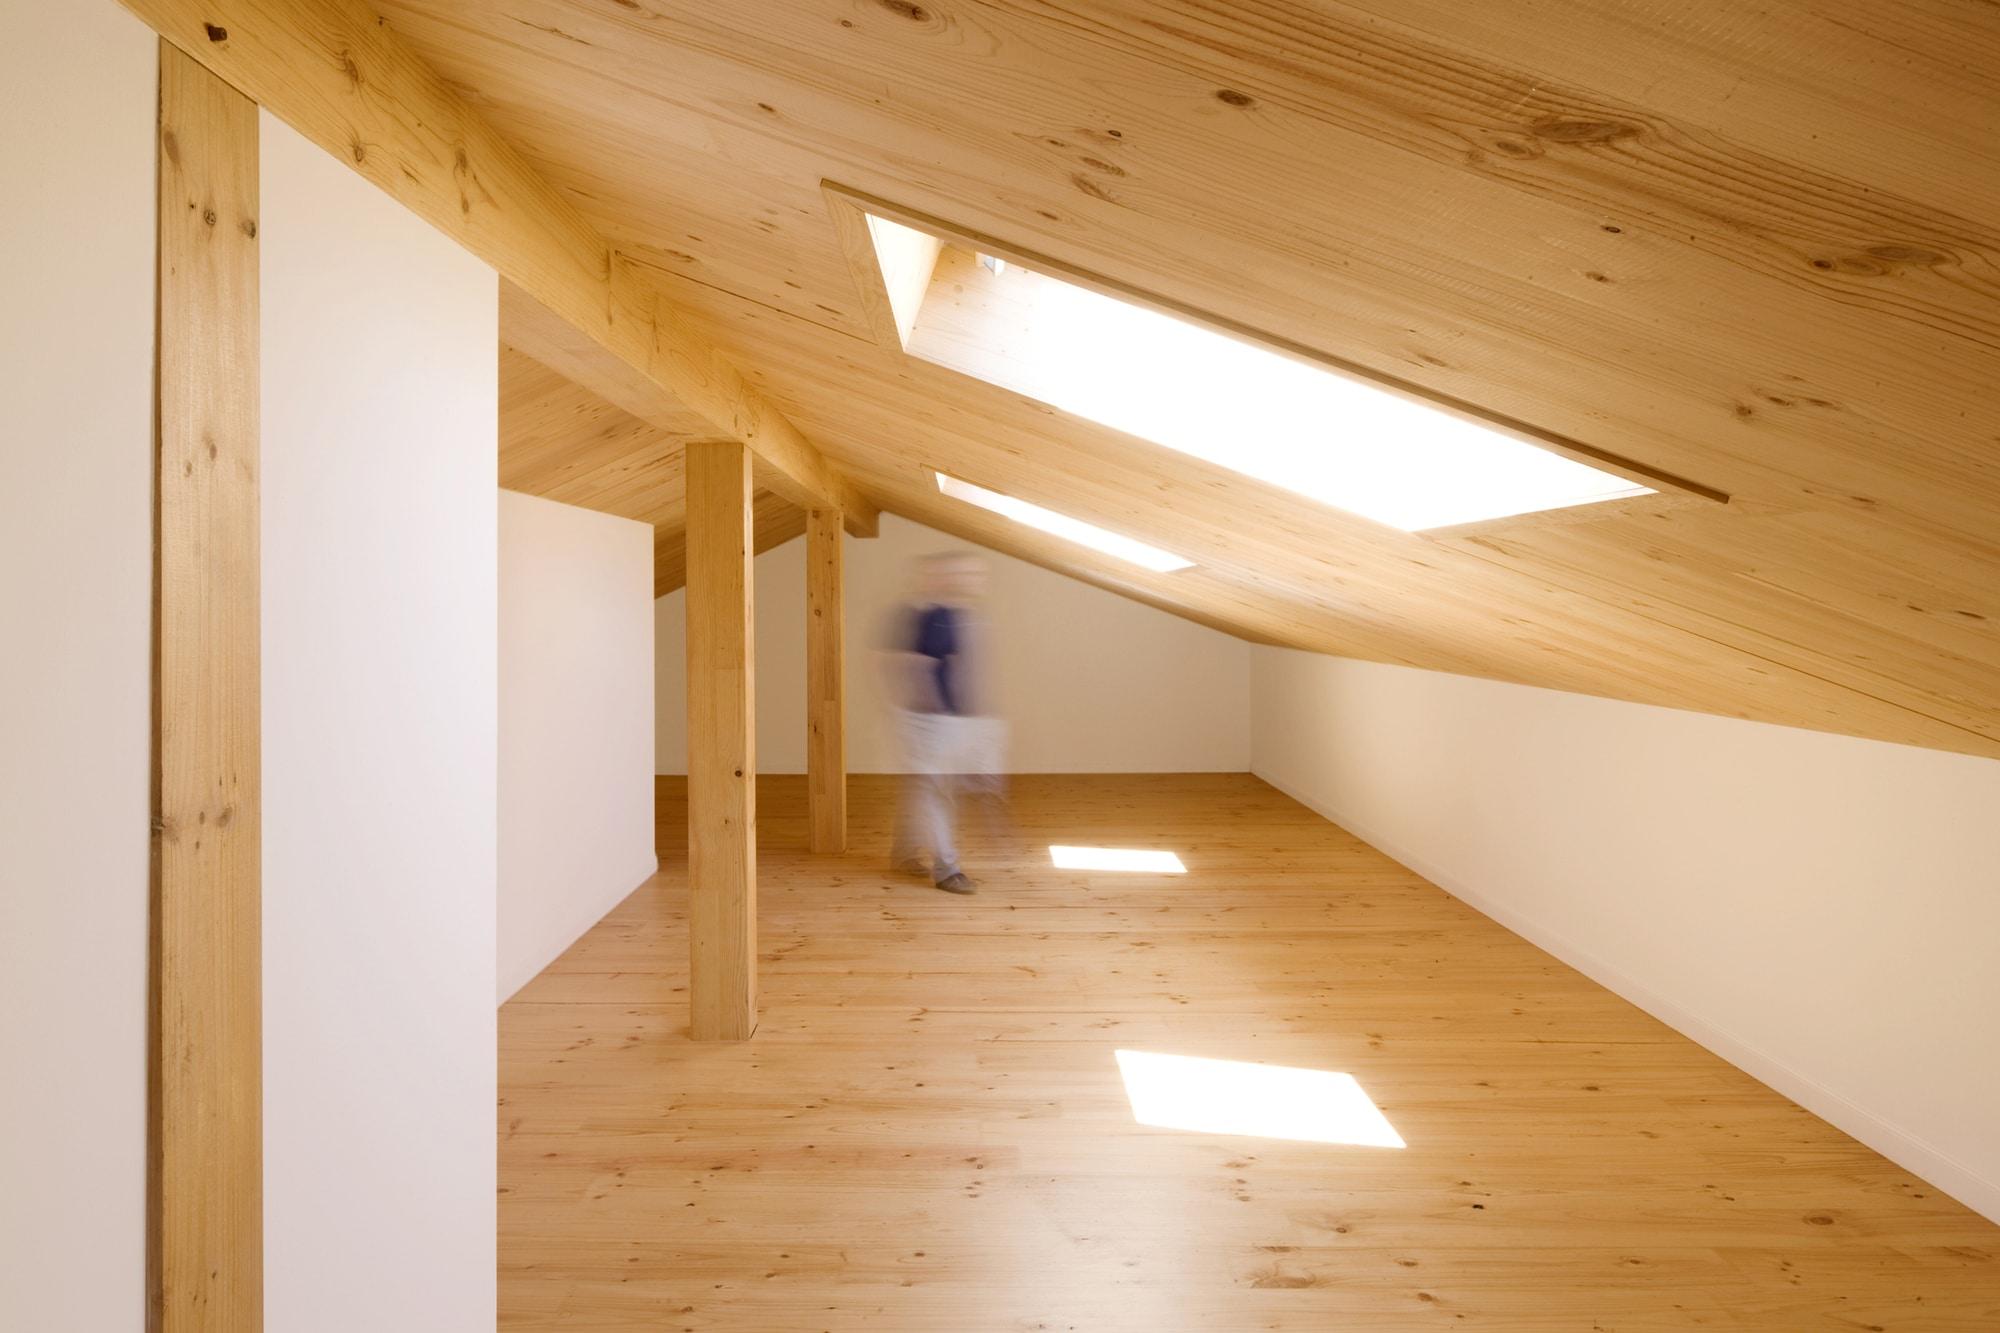 Dise o de casa r stica de piedra planos construye hogar - Construir altillo madera ...